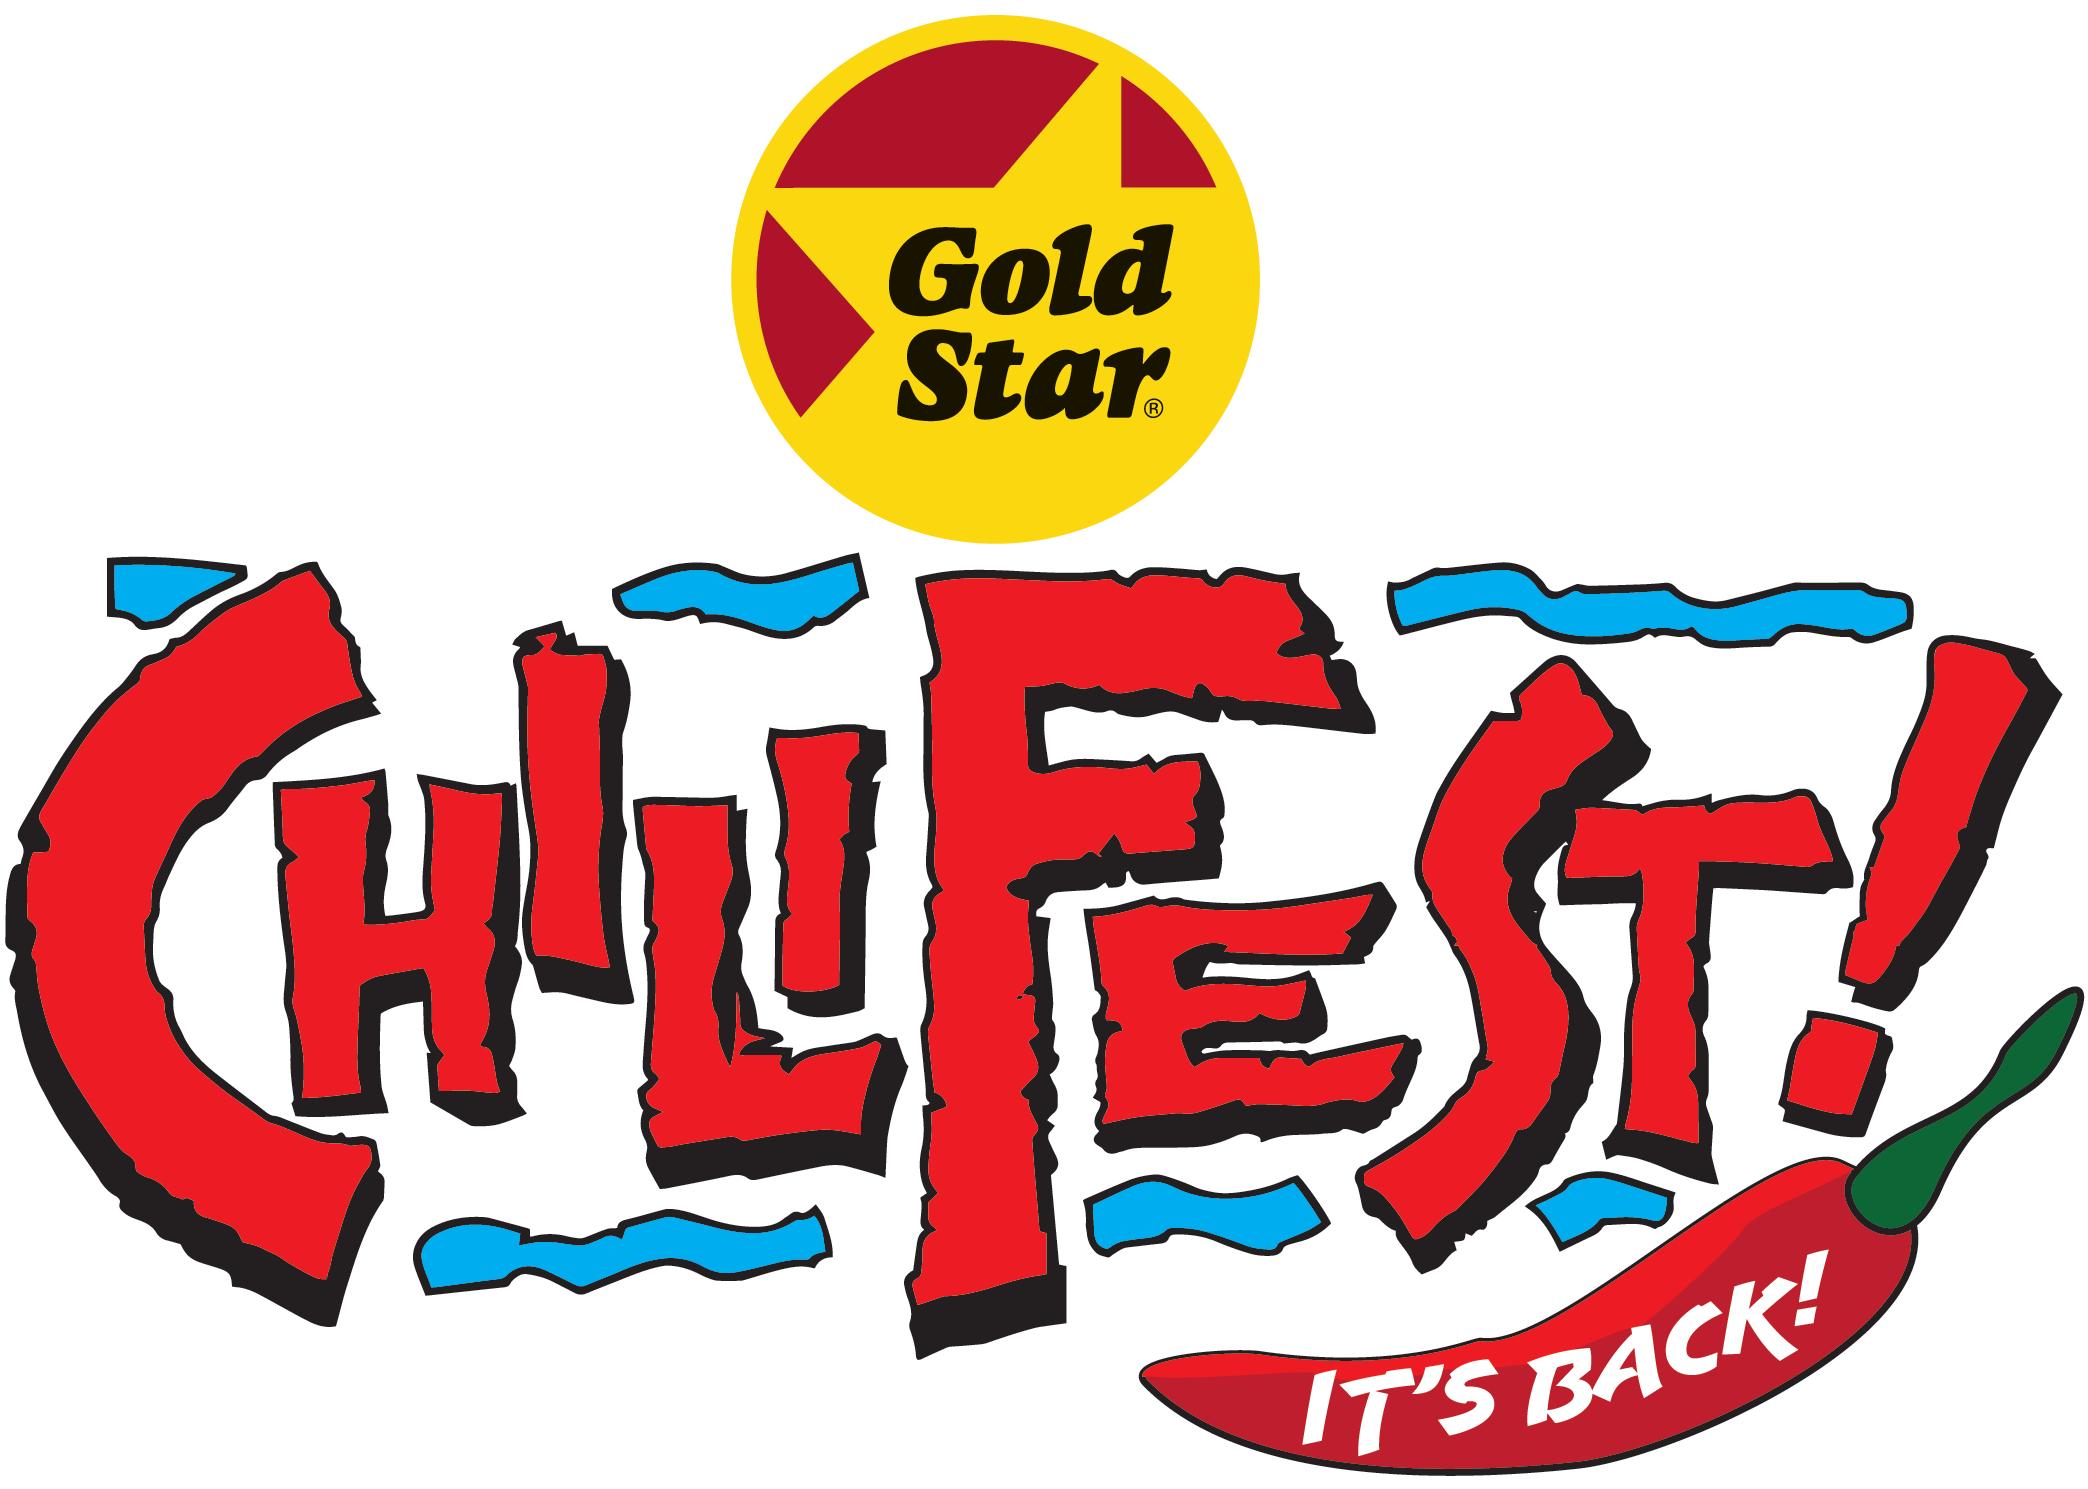 Gold Star ChiliFest